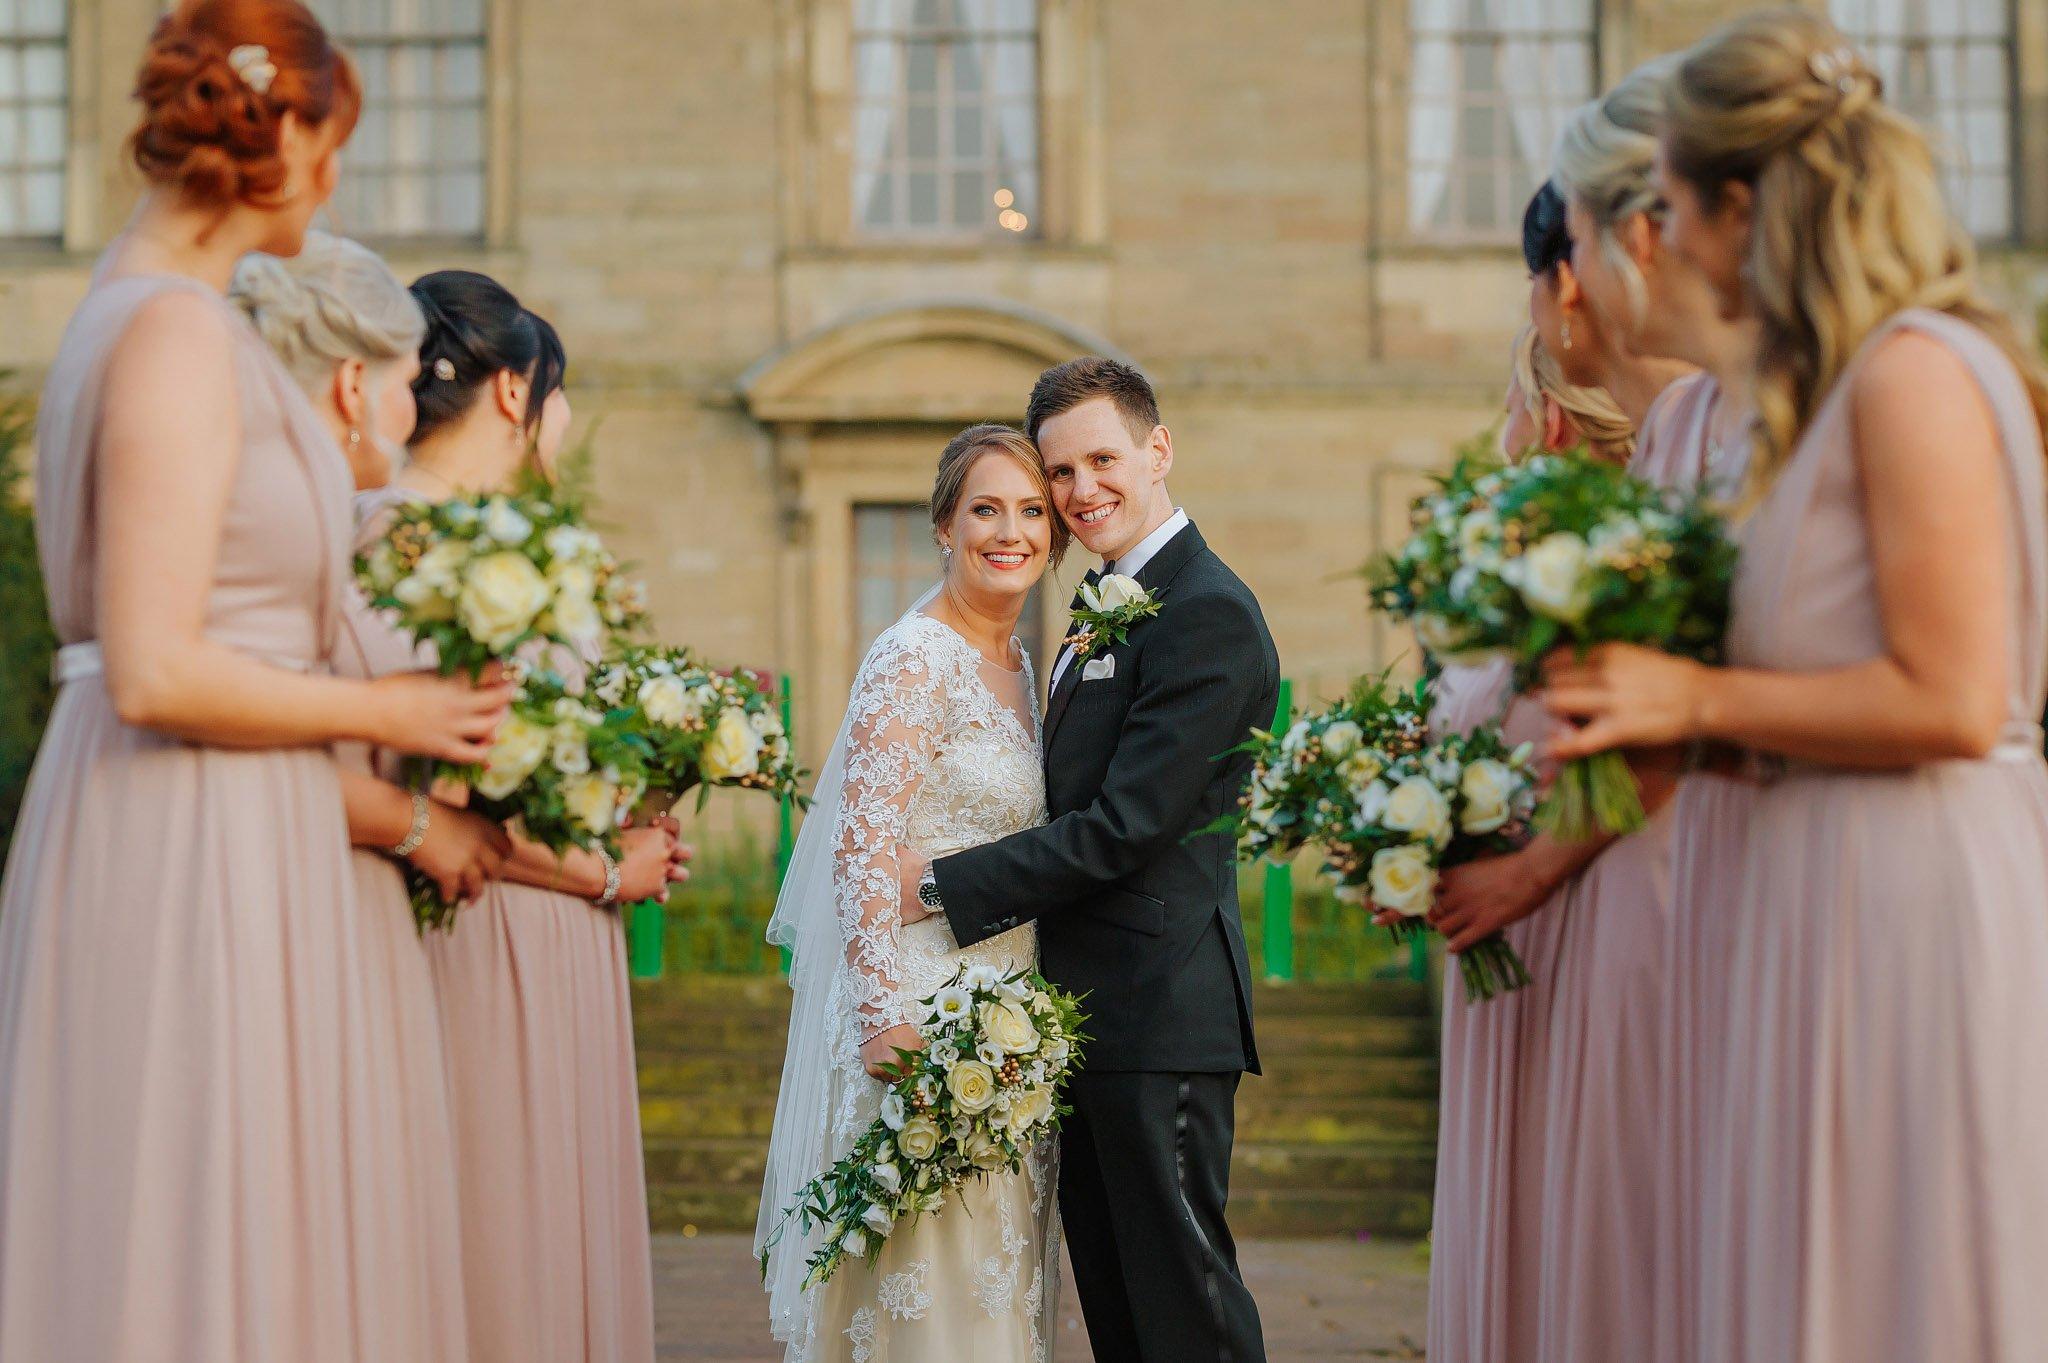 Coombe Abbey wedding in Coventry, Warwickshire - Sam + Matt 41